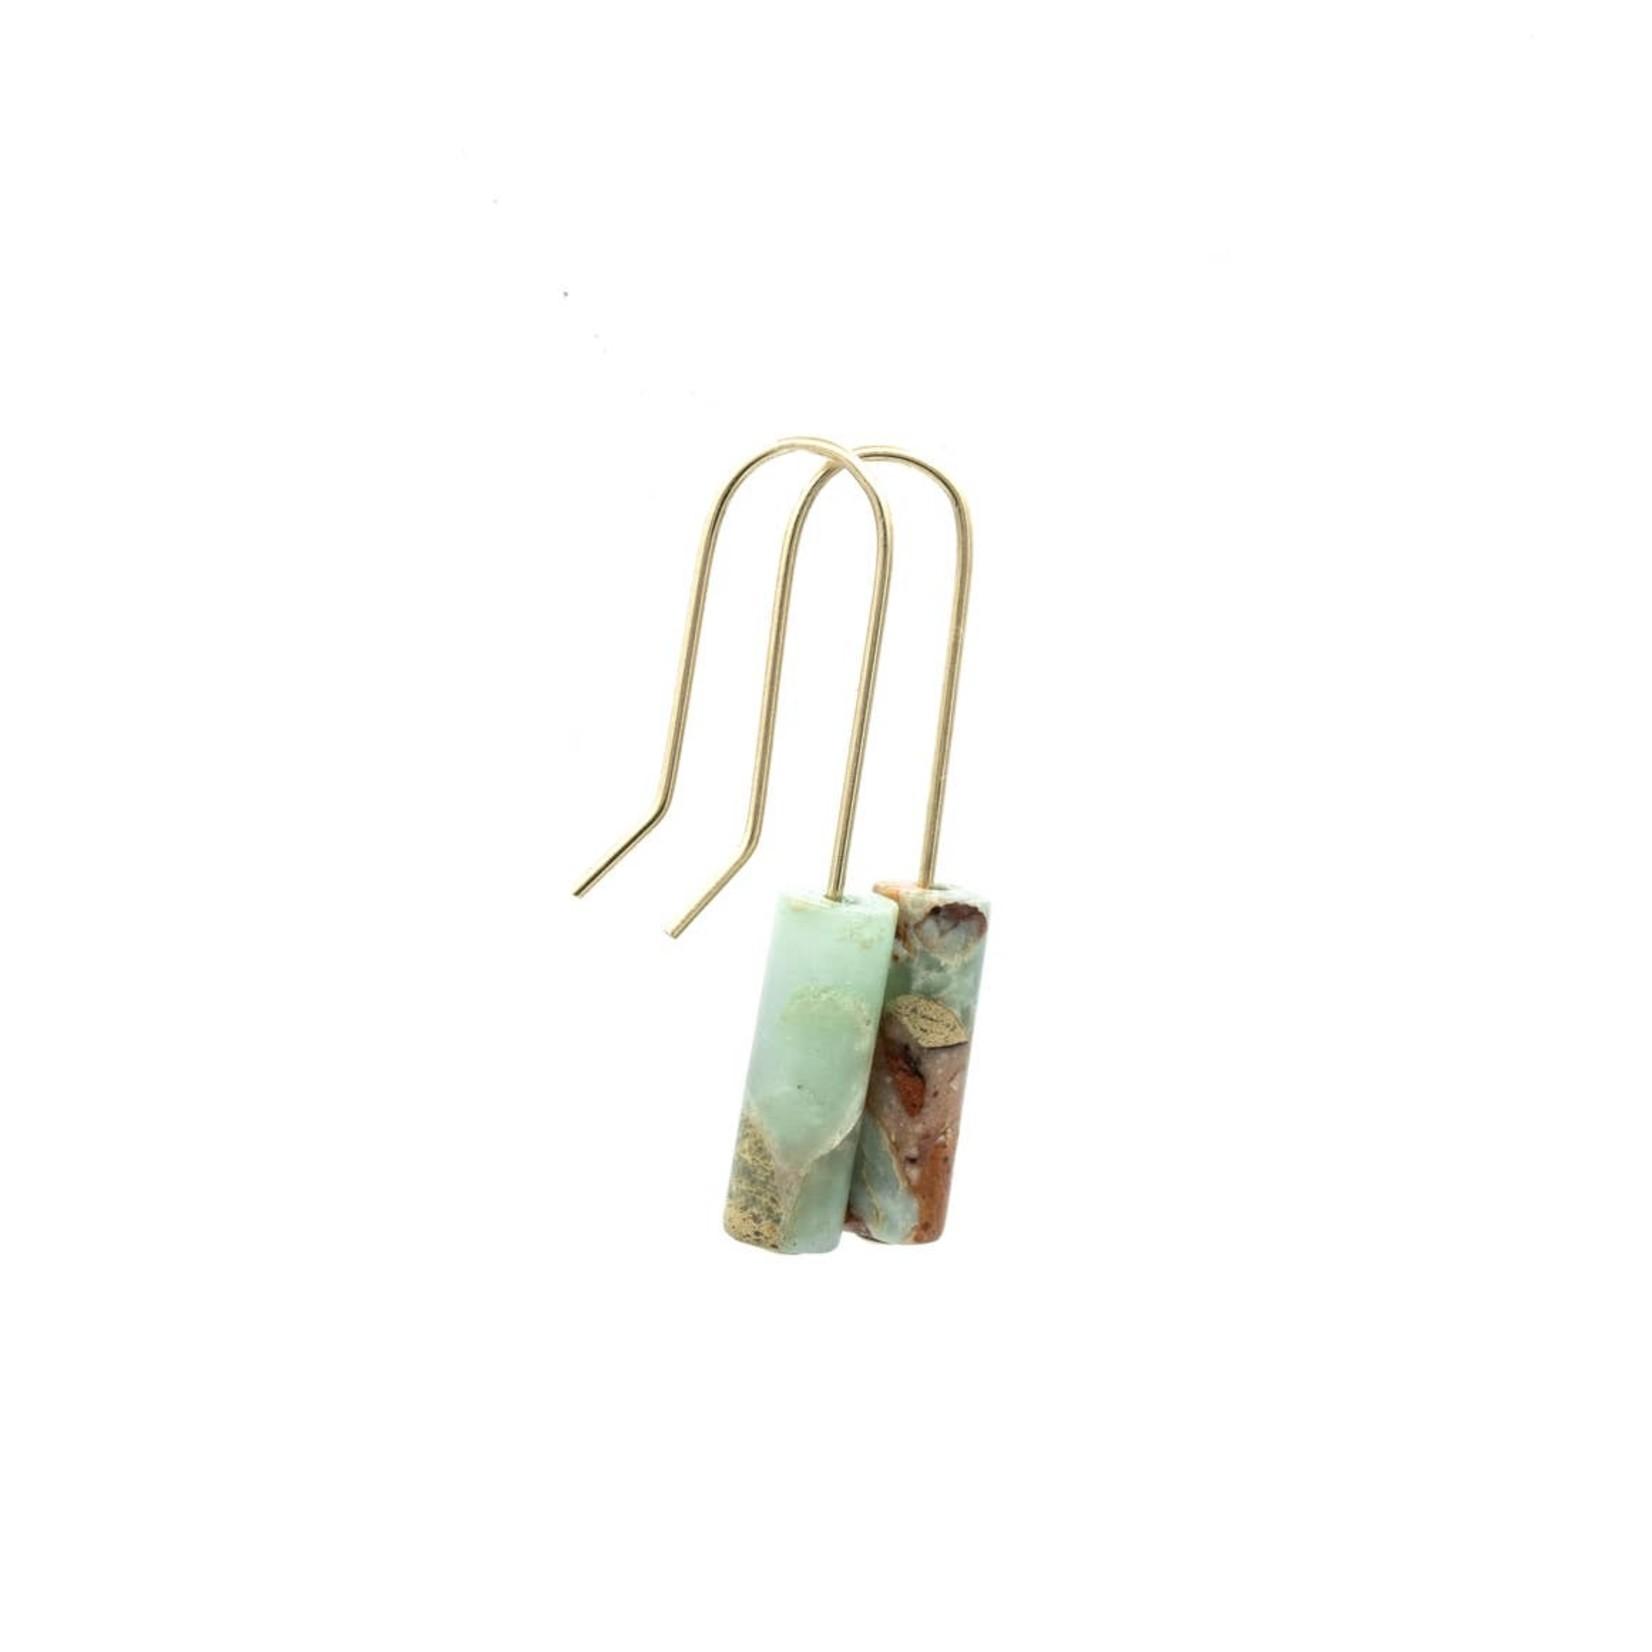 Mana Made Jewelry Mana Made Single Stone Earring Jasper